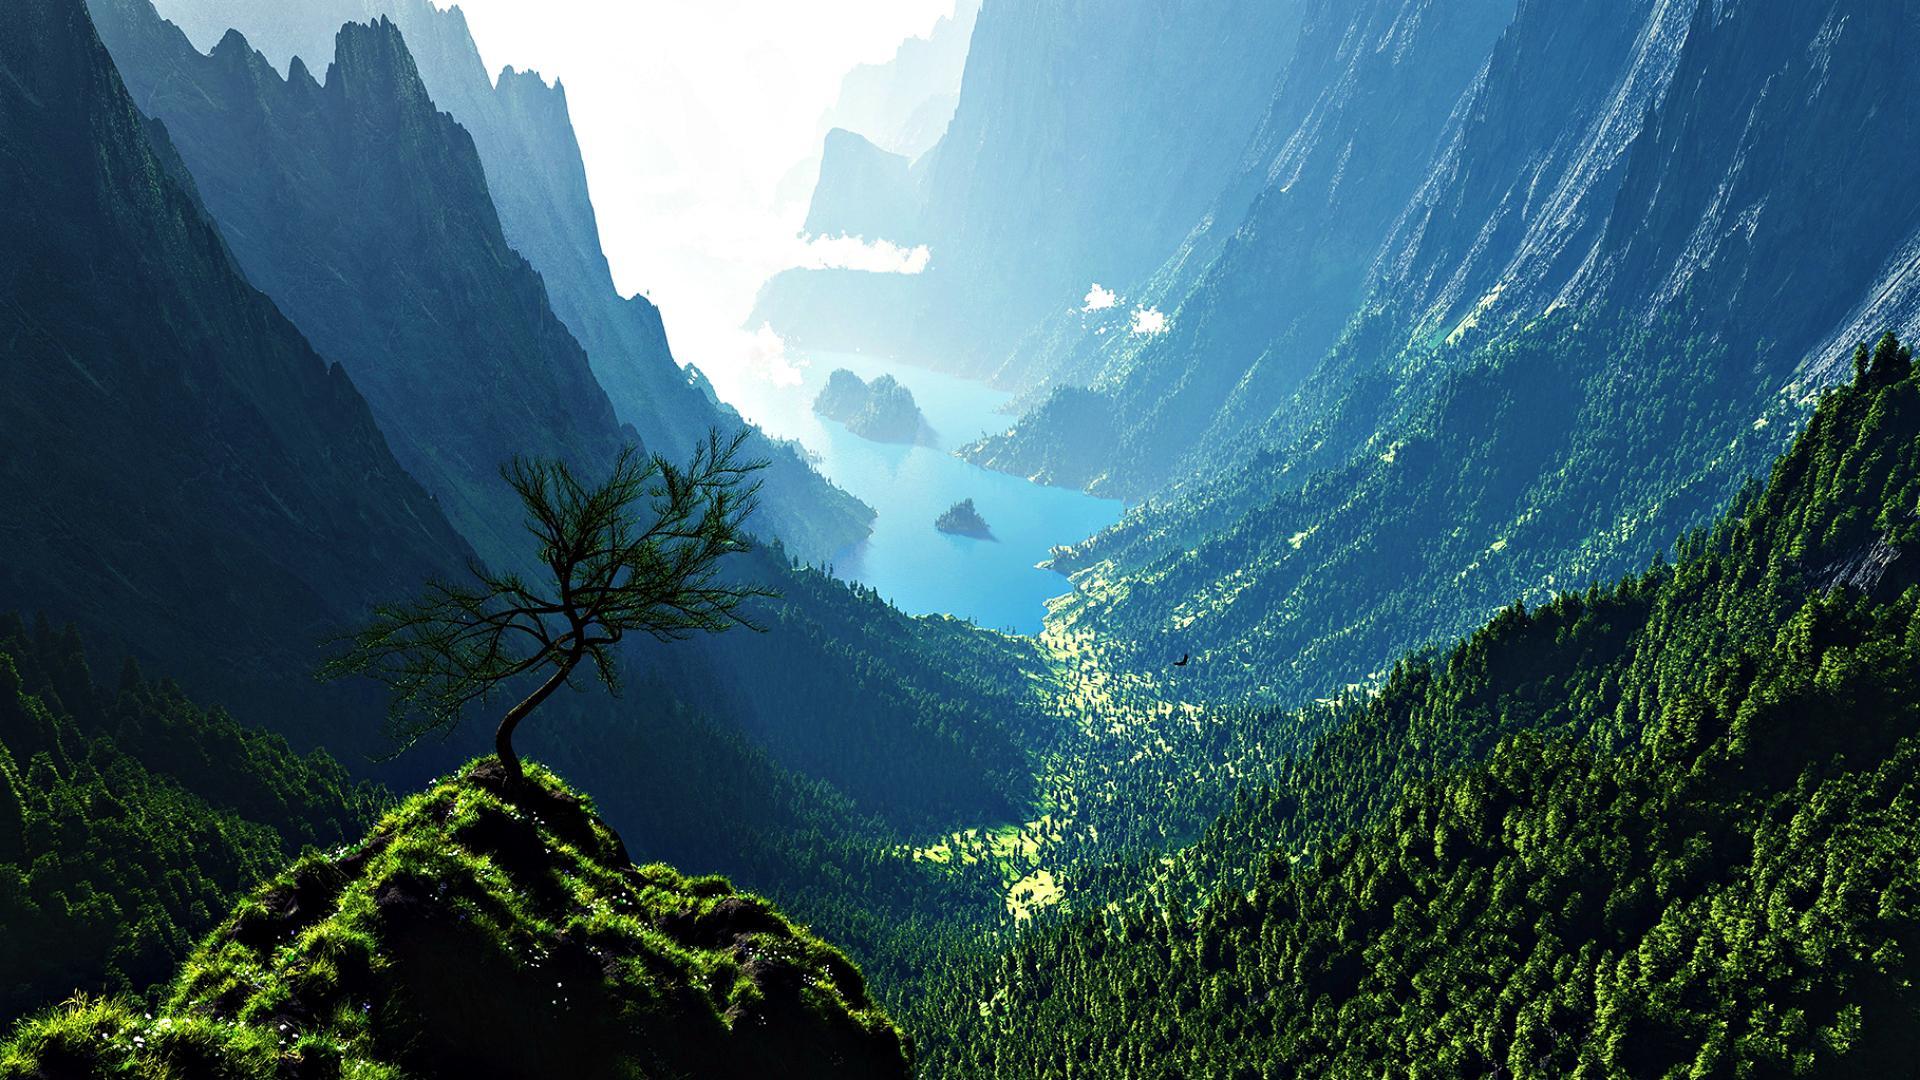 Amazing Mountain Valley Wallpaper